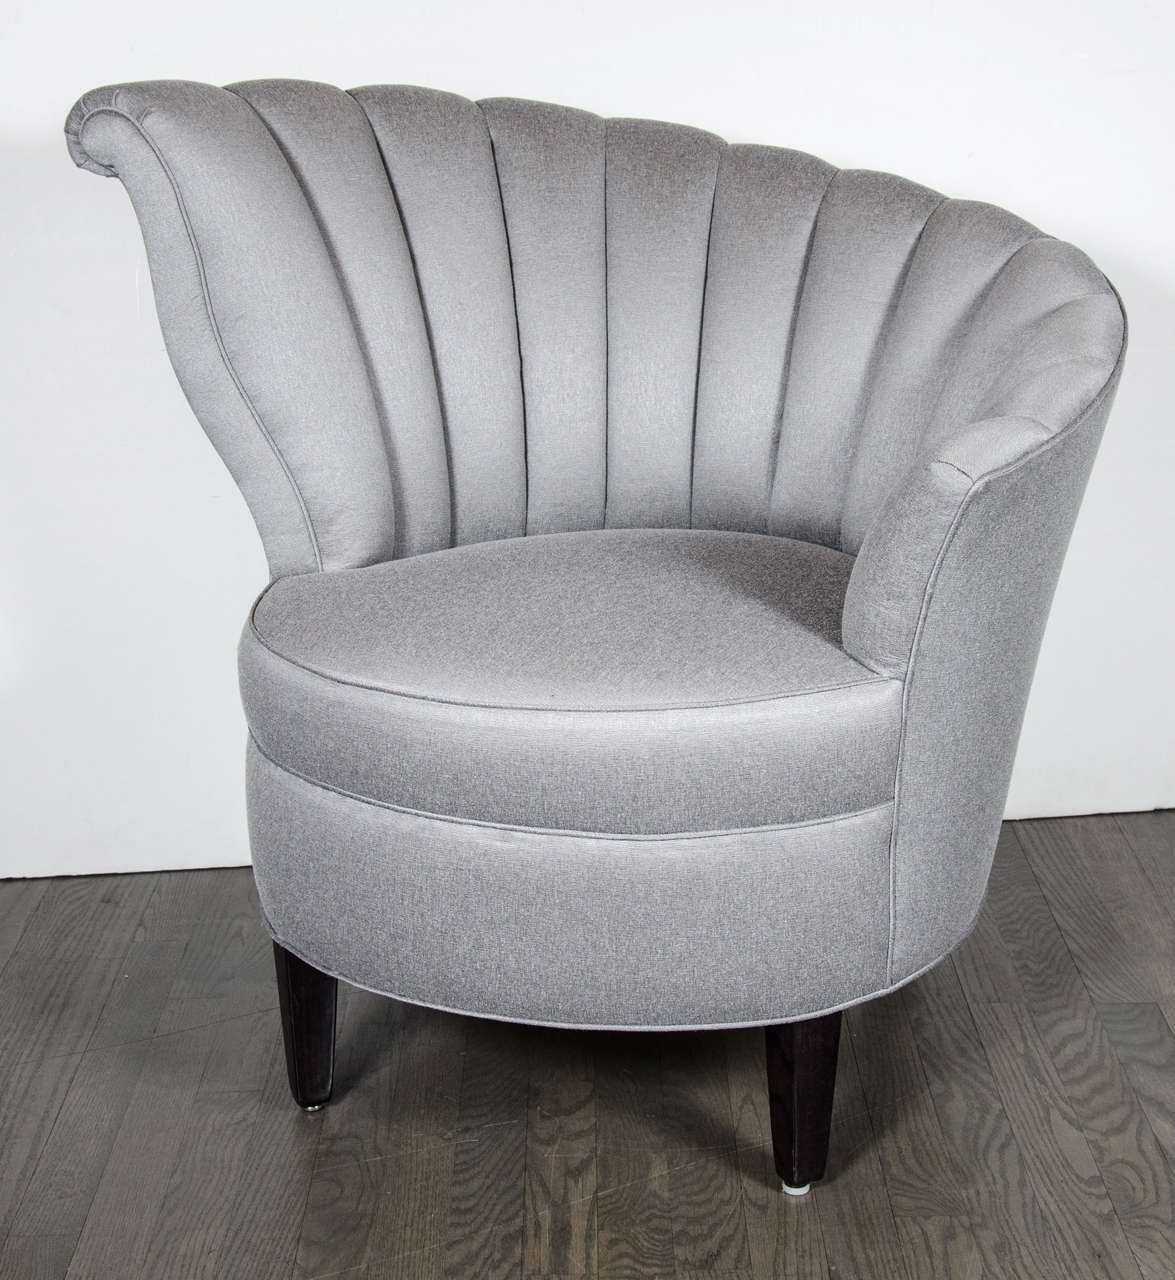 Marvelous Glamorous Pair Of 1940s Asymmetrical Fan Back Chairs In Platinum Sharkskin